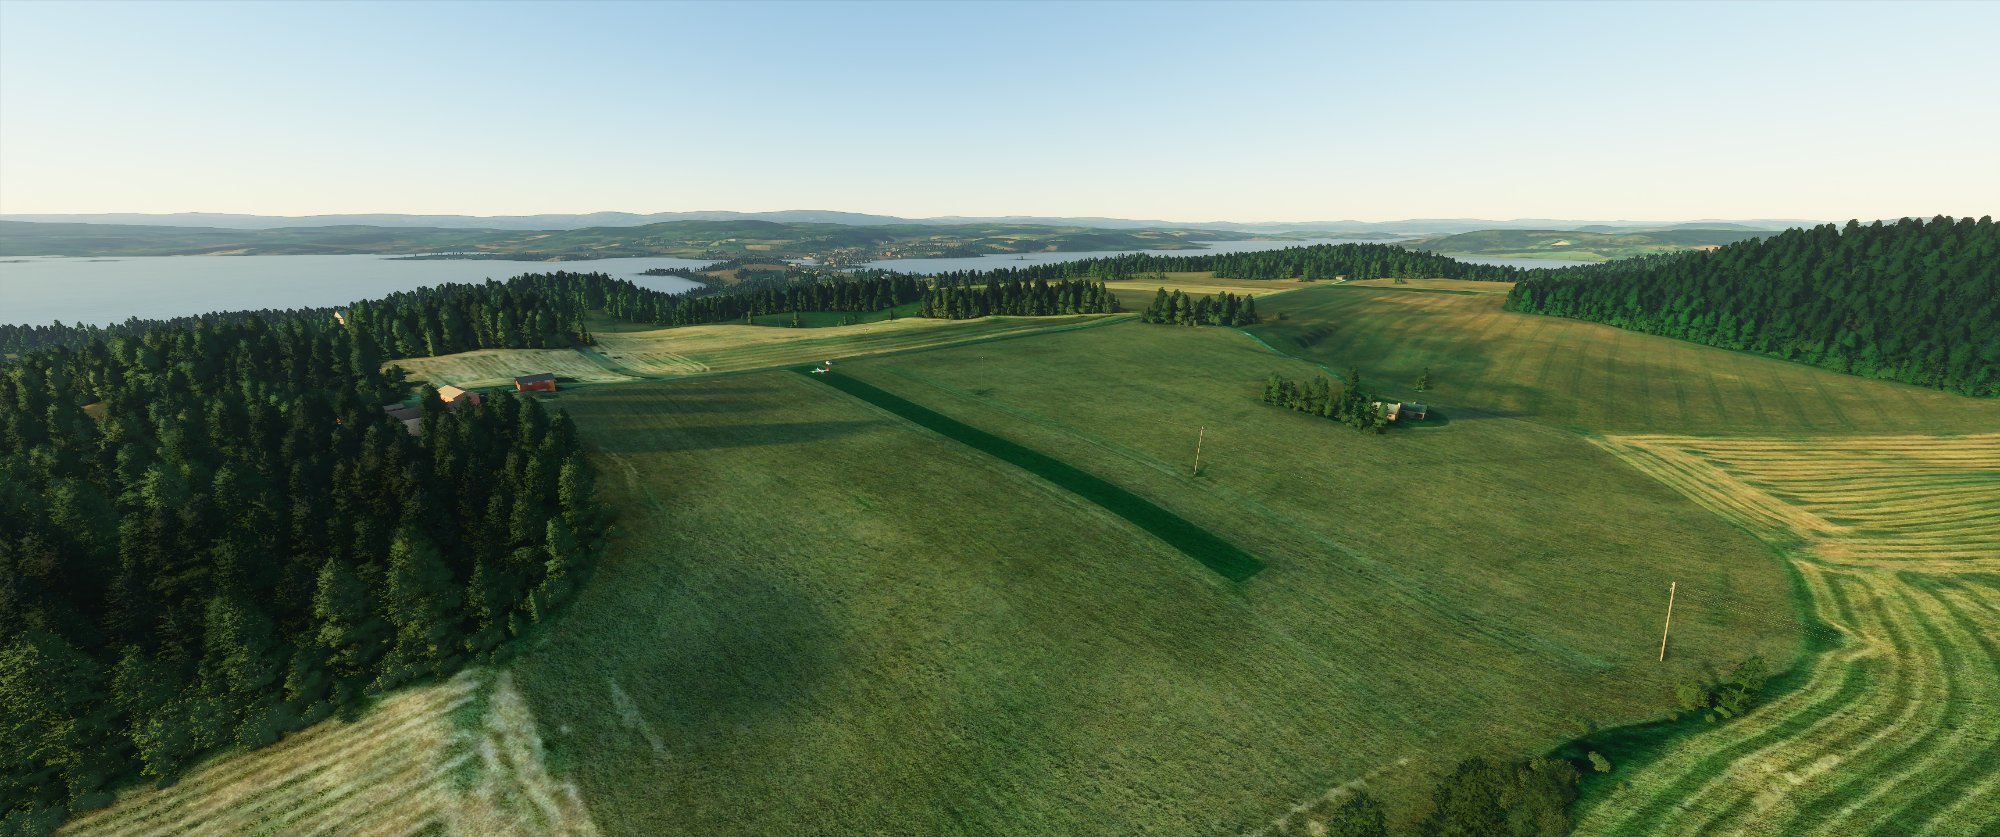 Microsoft Flight Simulator Screenshot 2020.10.20 - 21.09.07.21.jpg